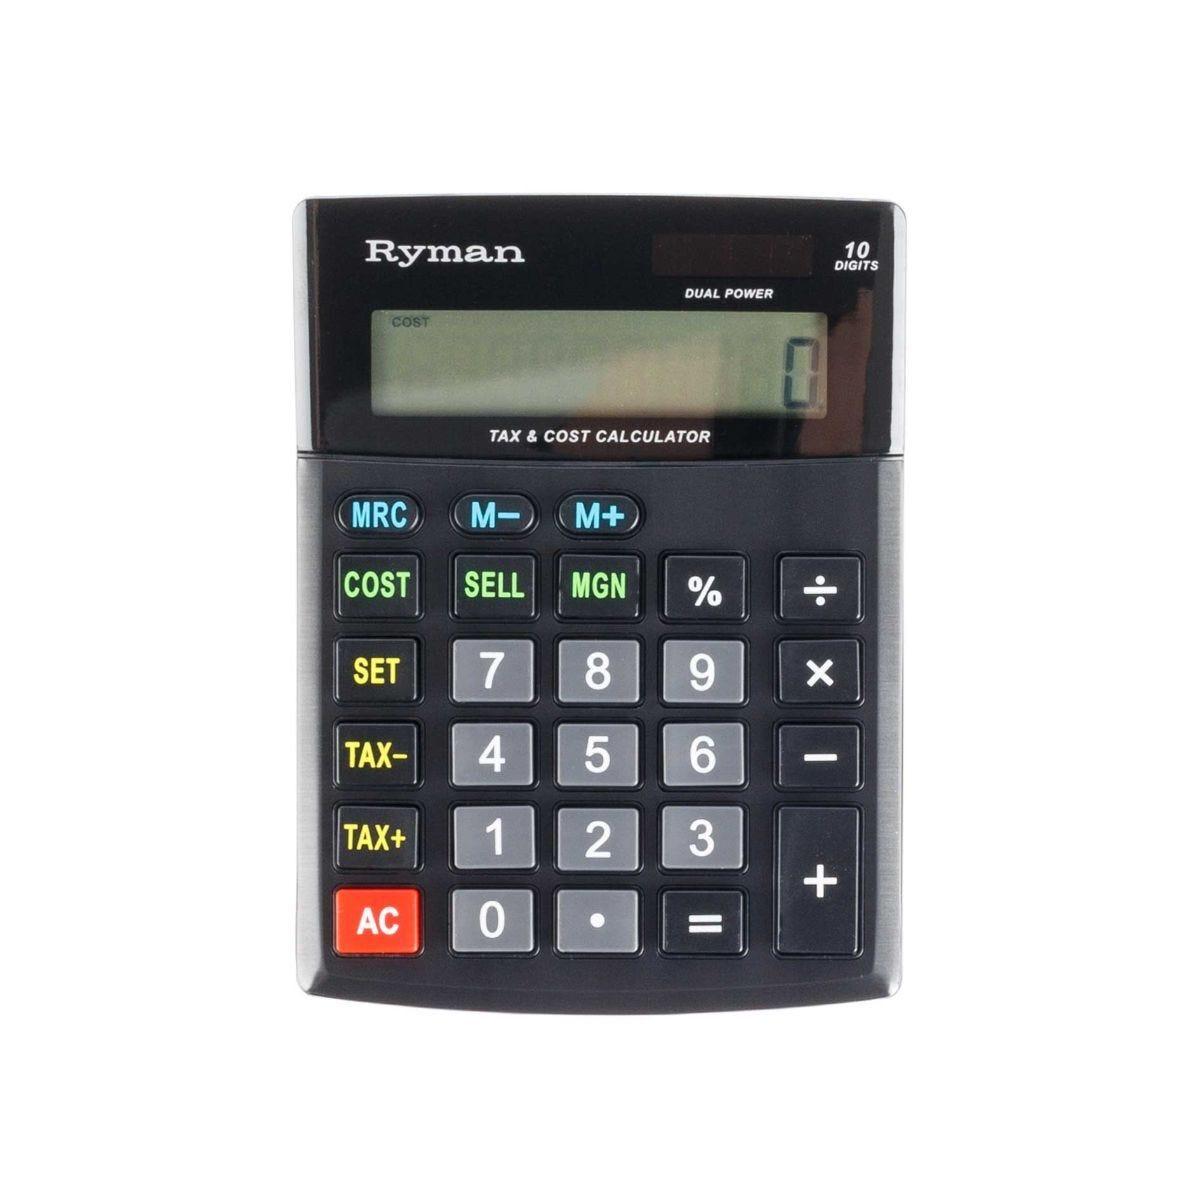 Ryman 10 Digit Calculator DX-10CSMTAX